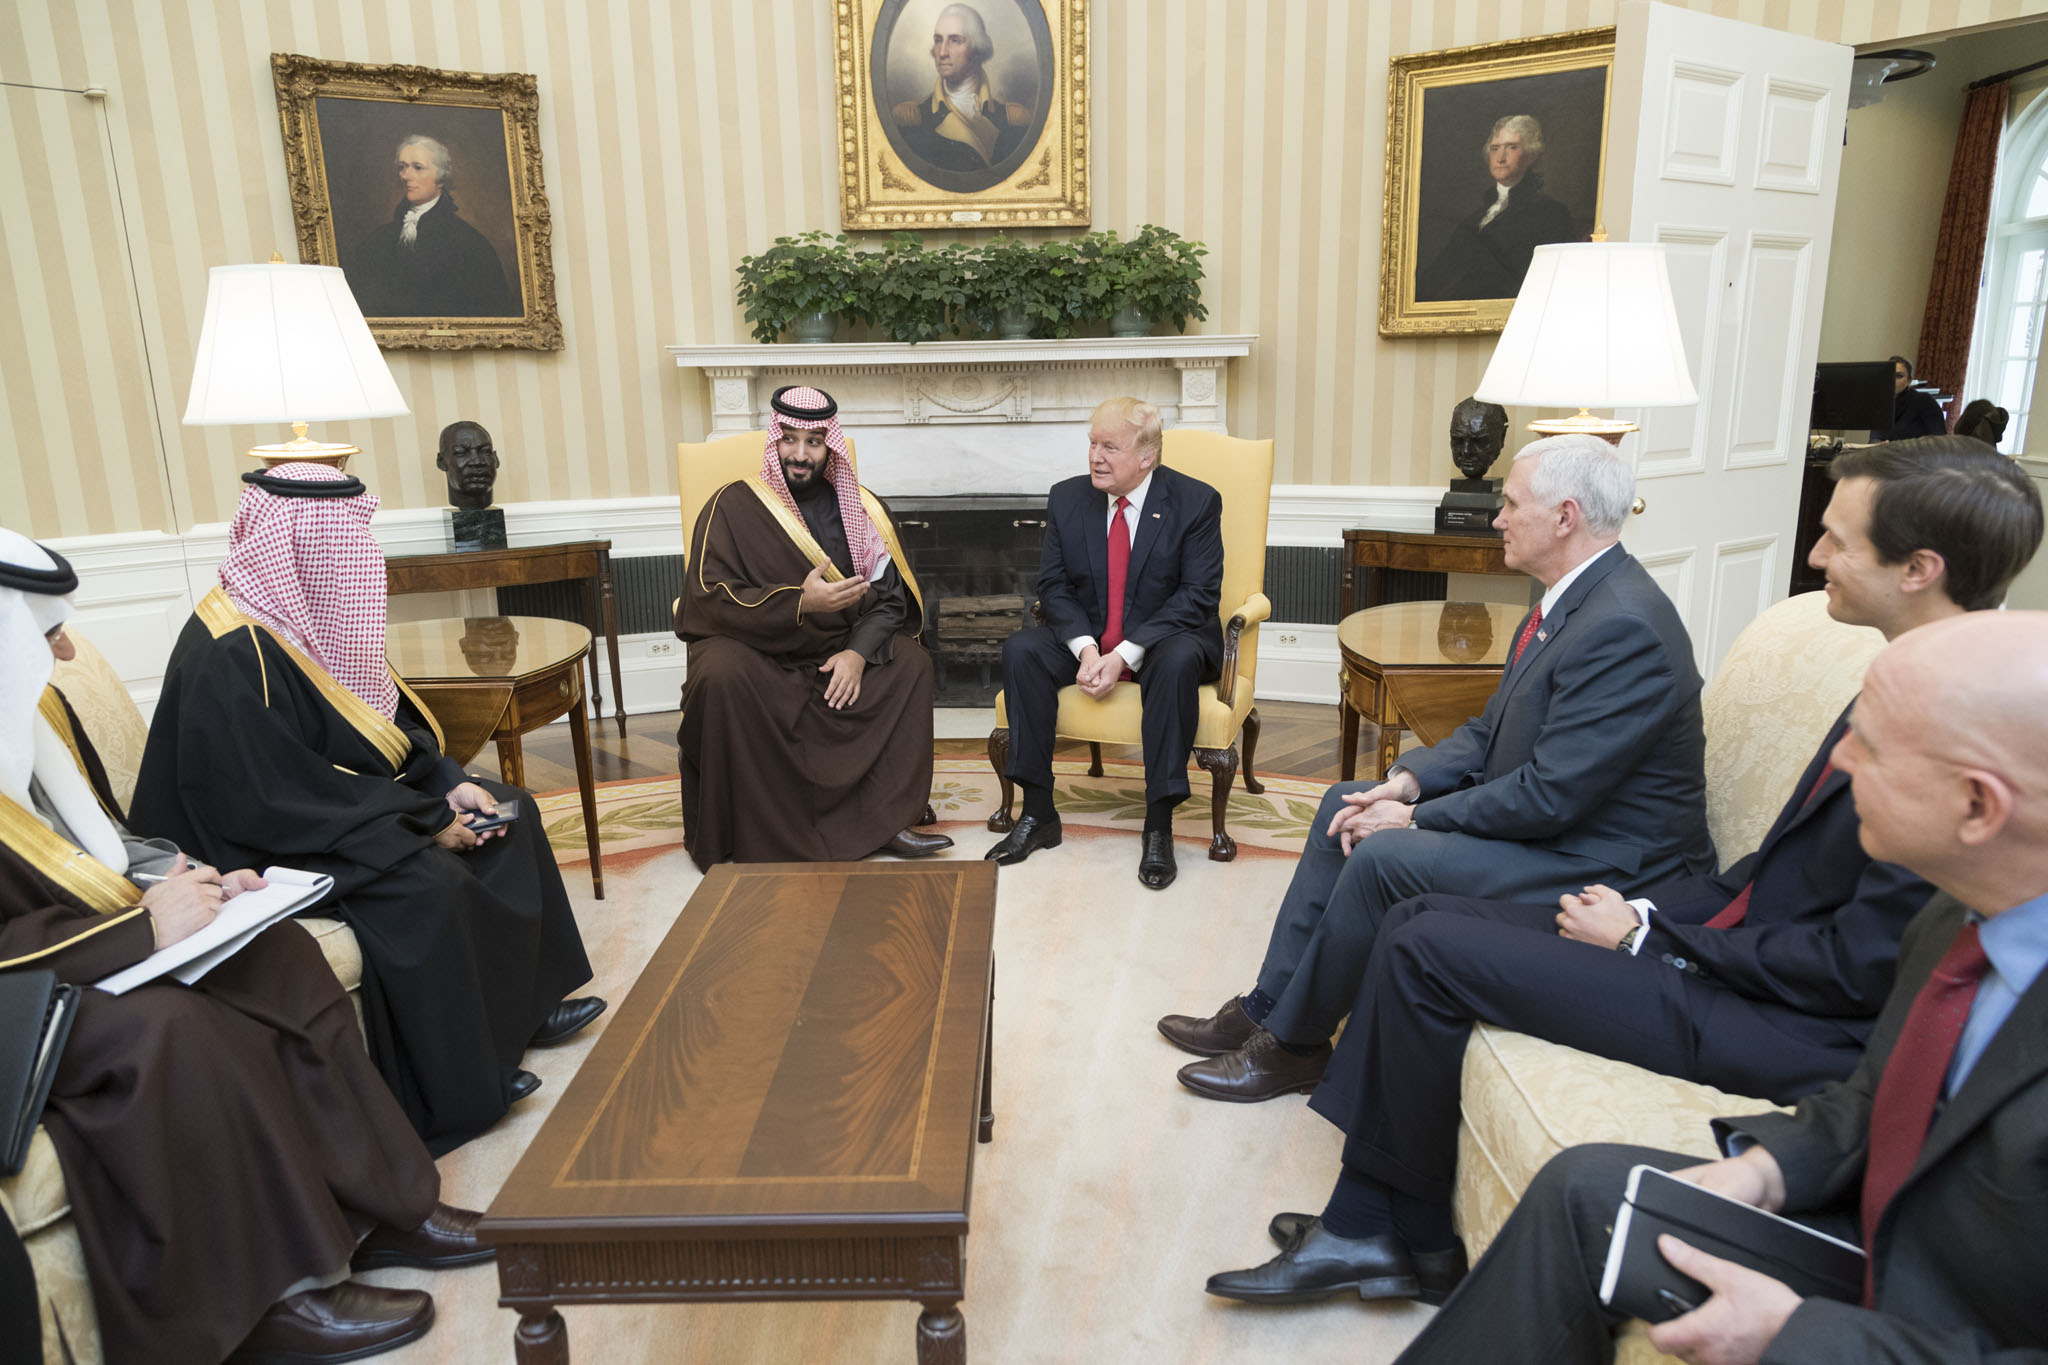 File:Donald Trump meets with Mohammed bin Salman bin Abdulaziz Al Saud,  March 2017.jpg - Wikimedia Commons